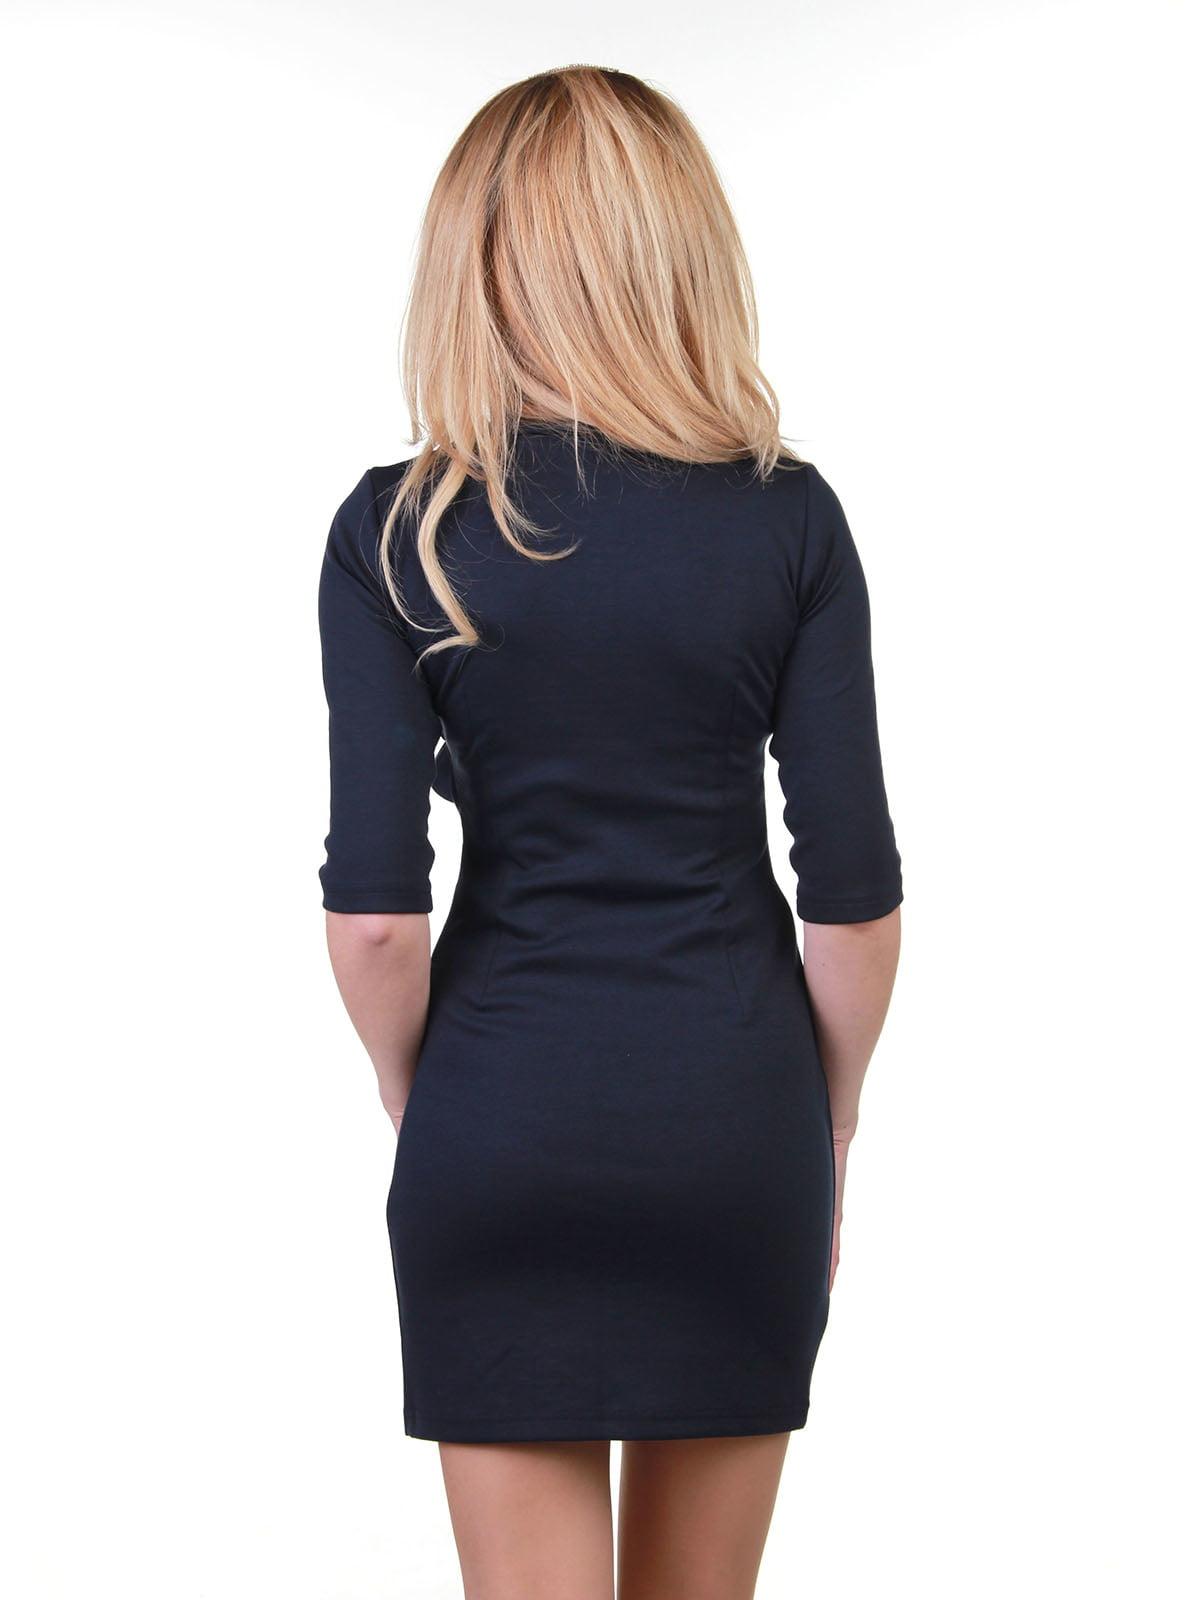 Платье темно-синее | 3823464 | фото 2